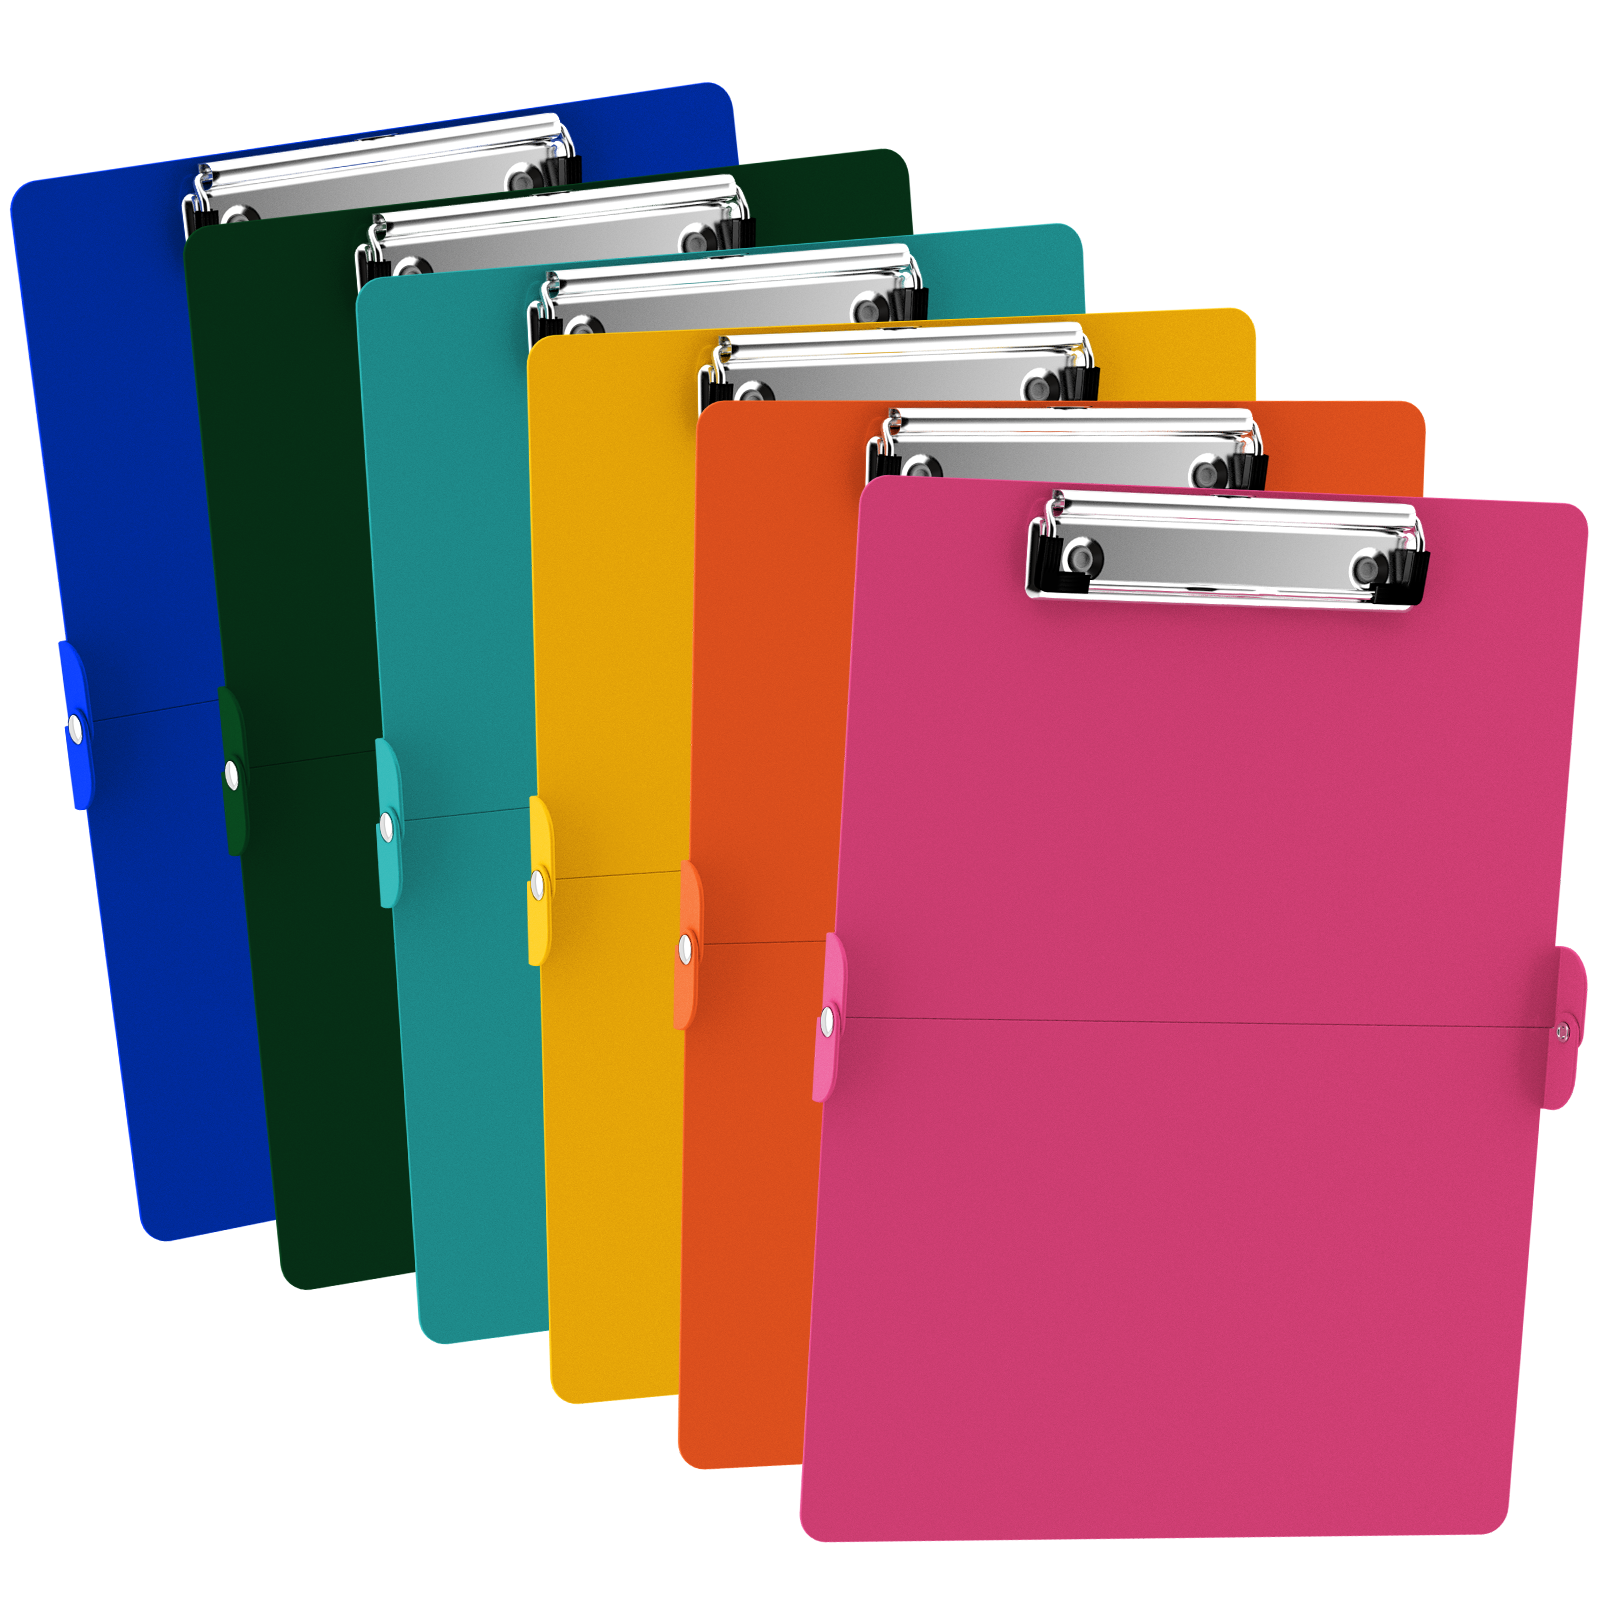 Clipboard clipart nursing clipboard. Clipboards by color